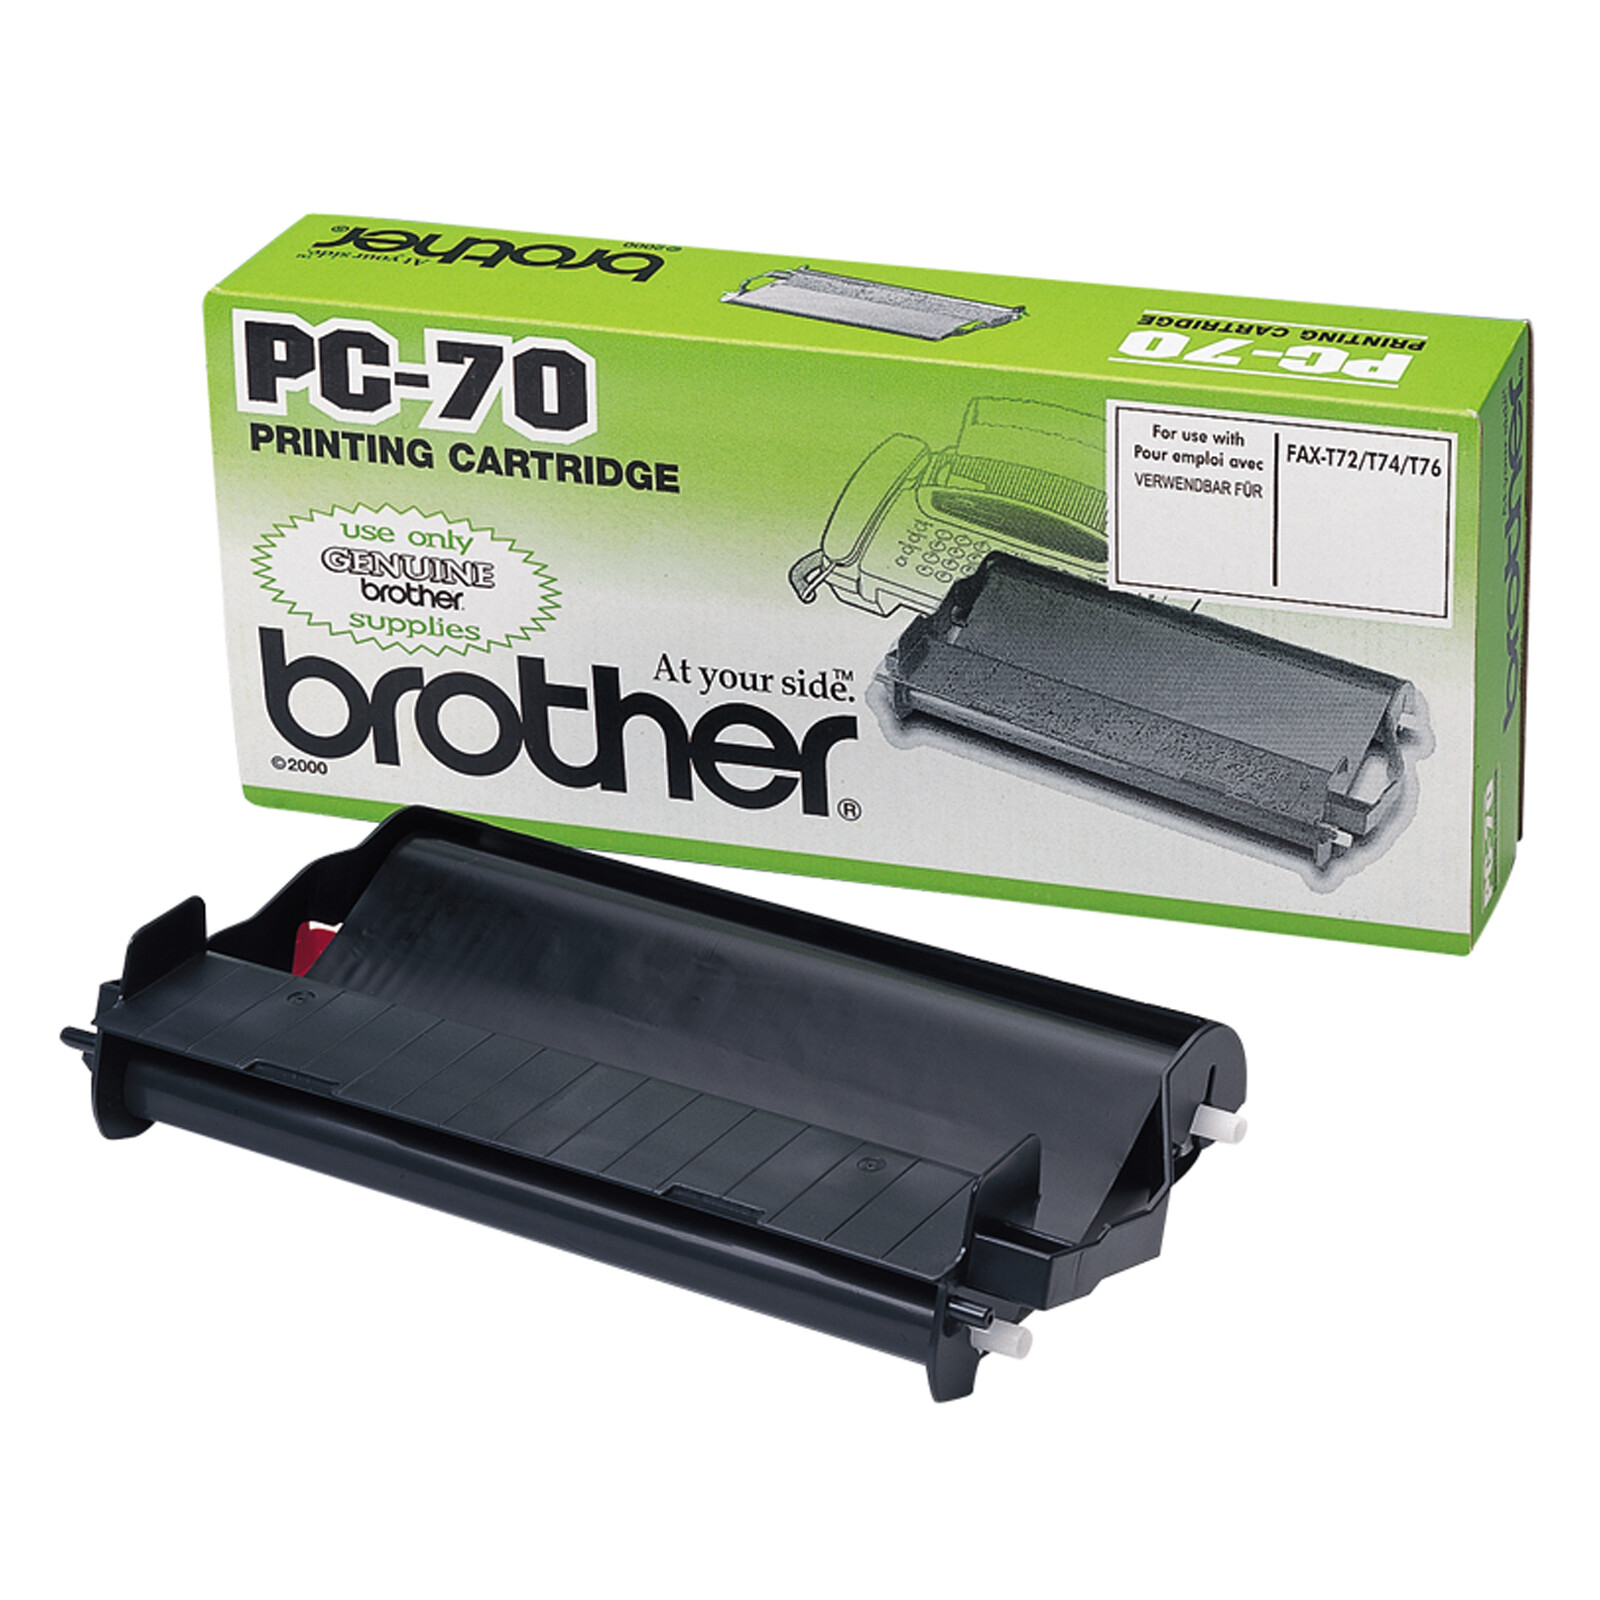 Brother PC-70 Thermotranferkit